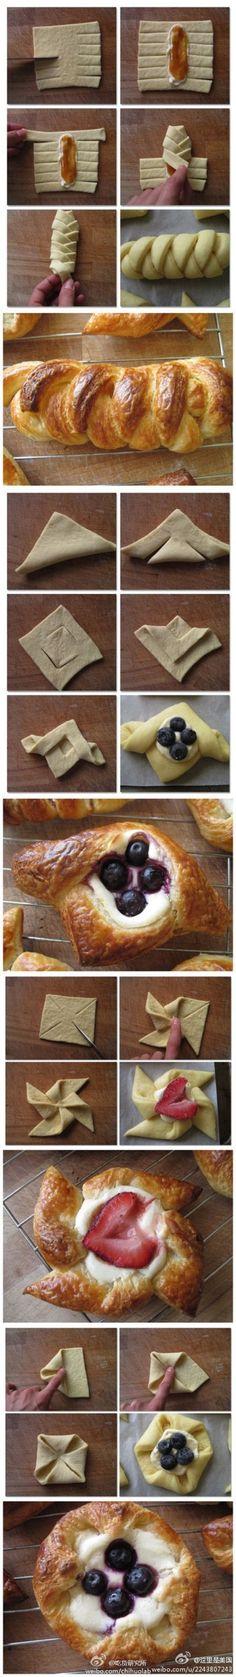 Pastry folding ideas.